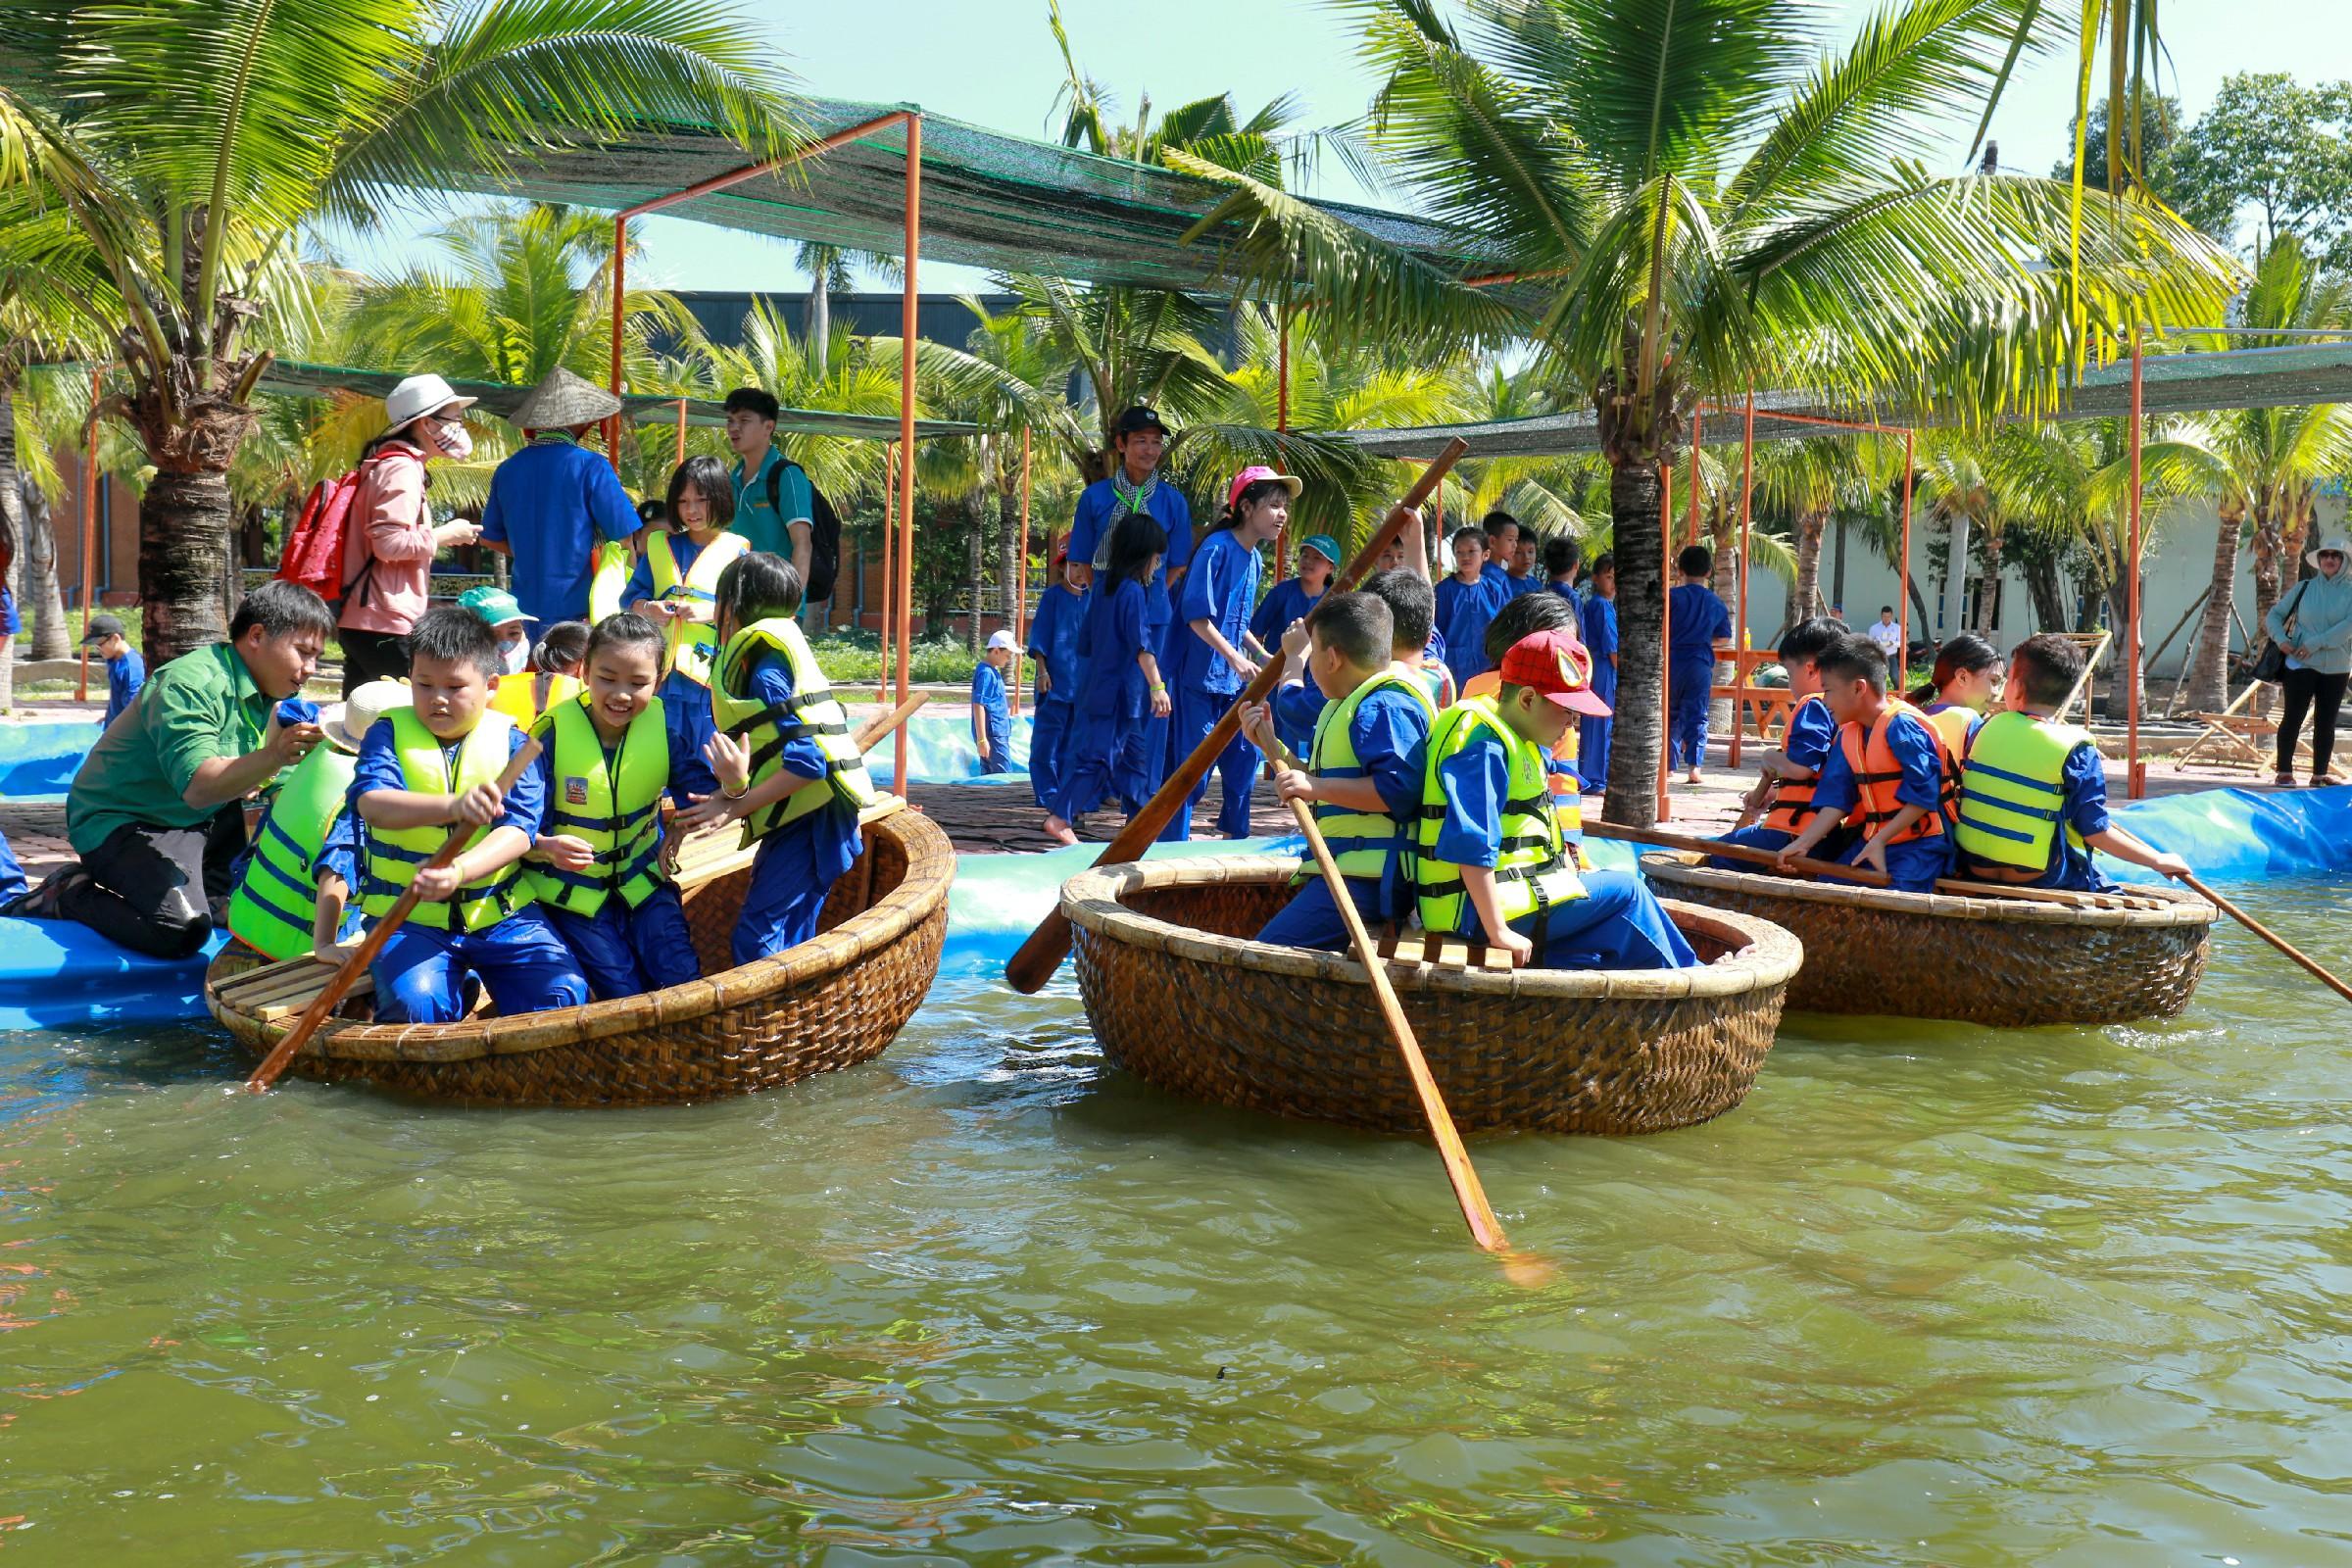 kids sailing basket boats